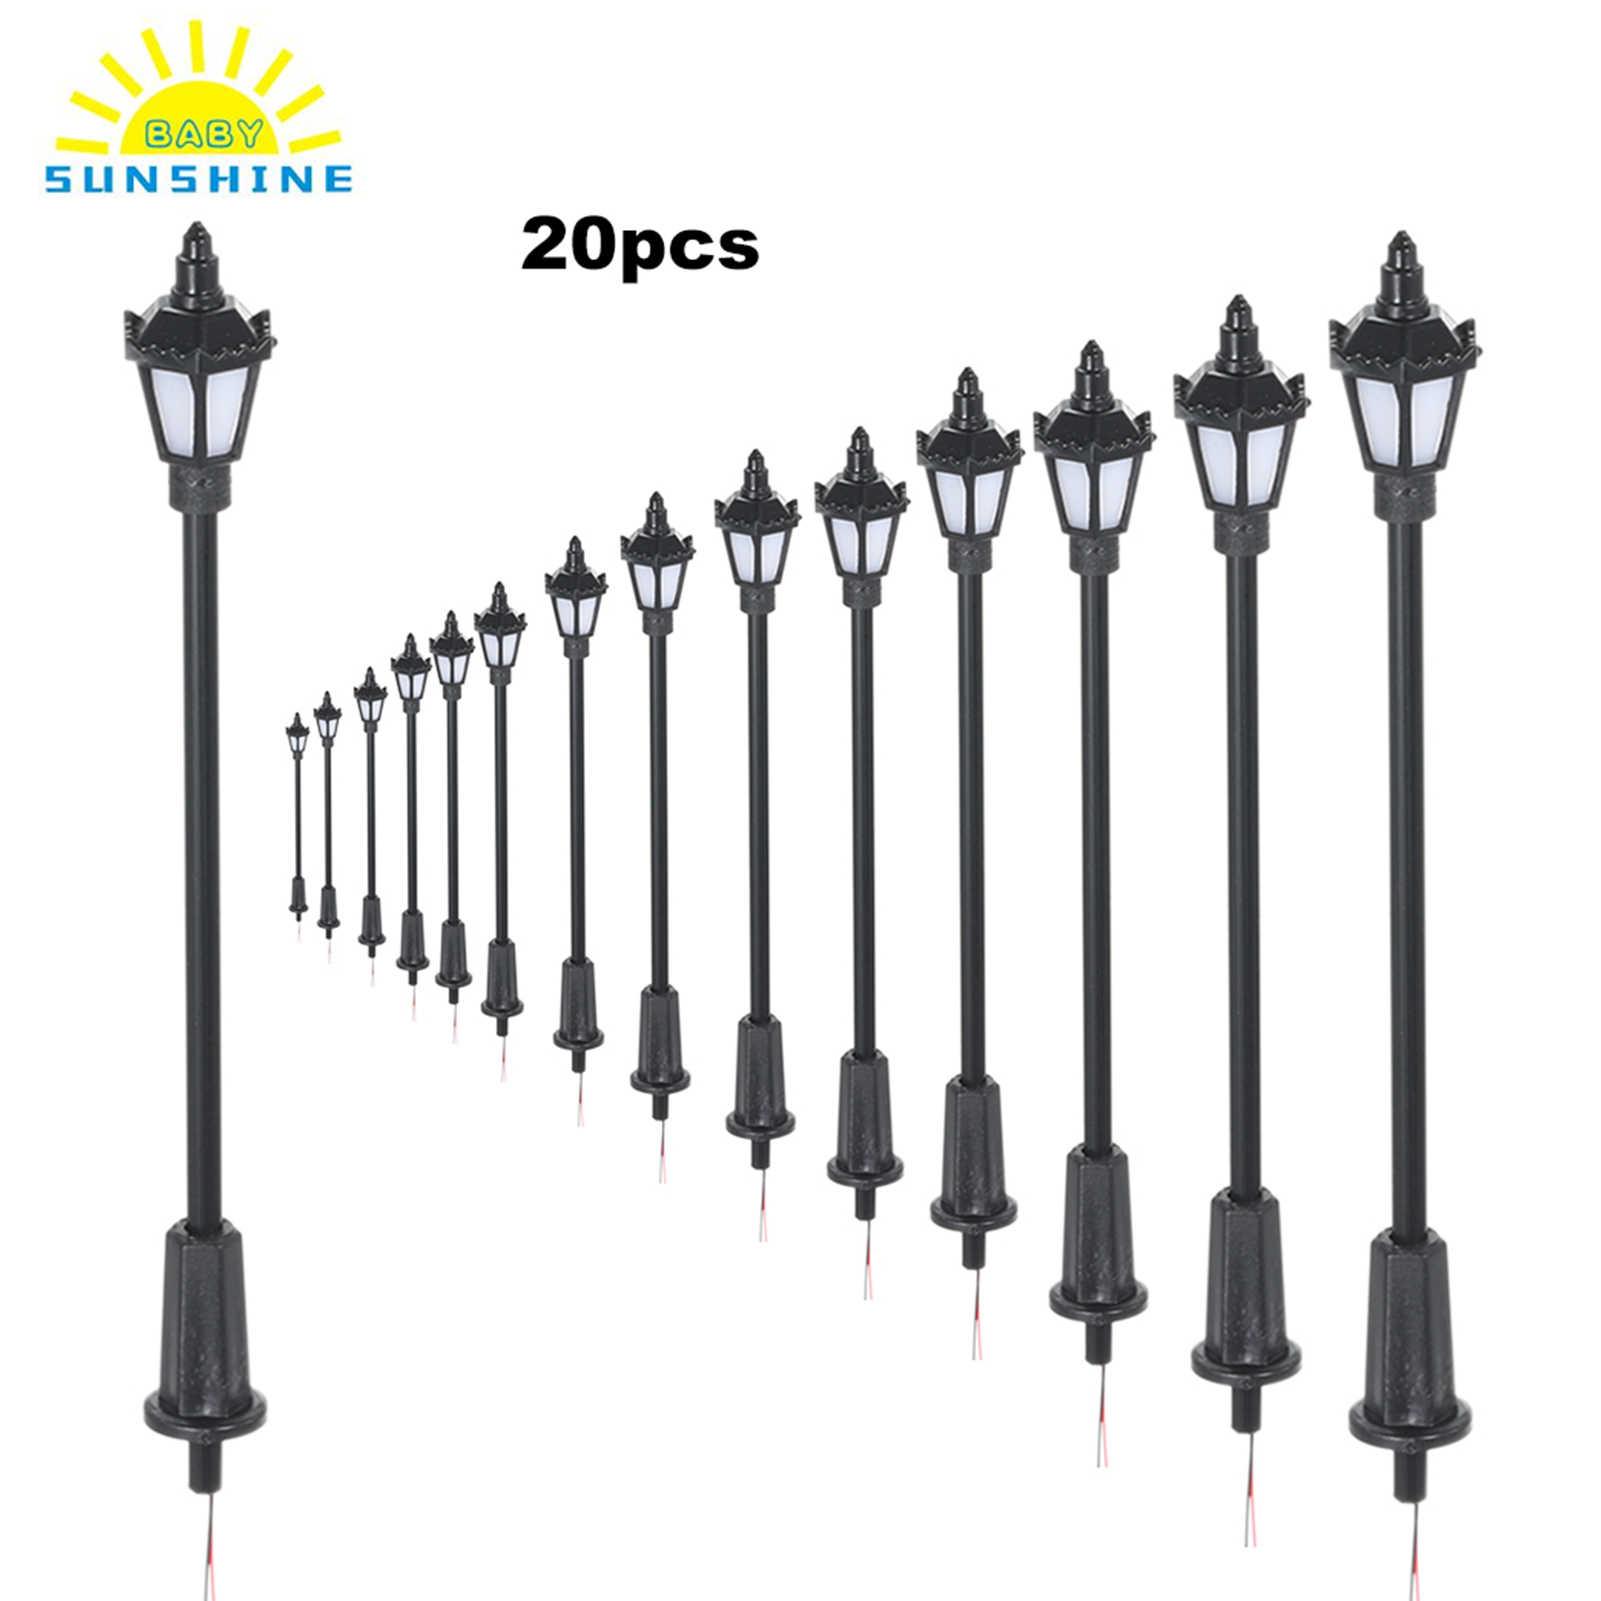 20 Pcs 1:150 HO Scale LED Street Lights Train Railway Park Lamp Posts Model